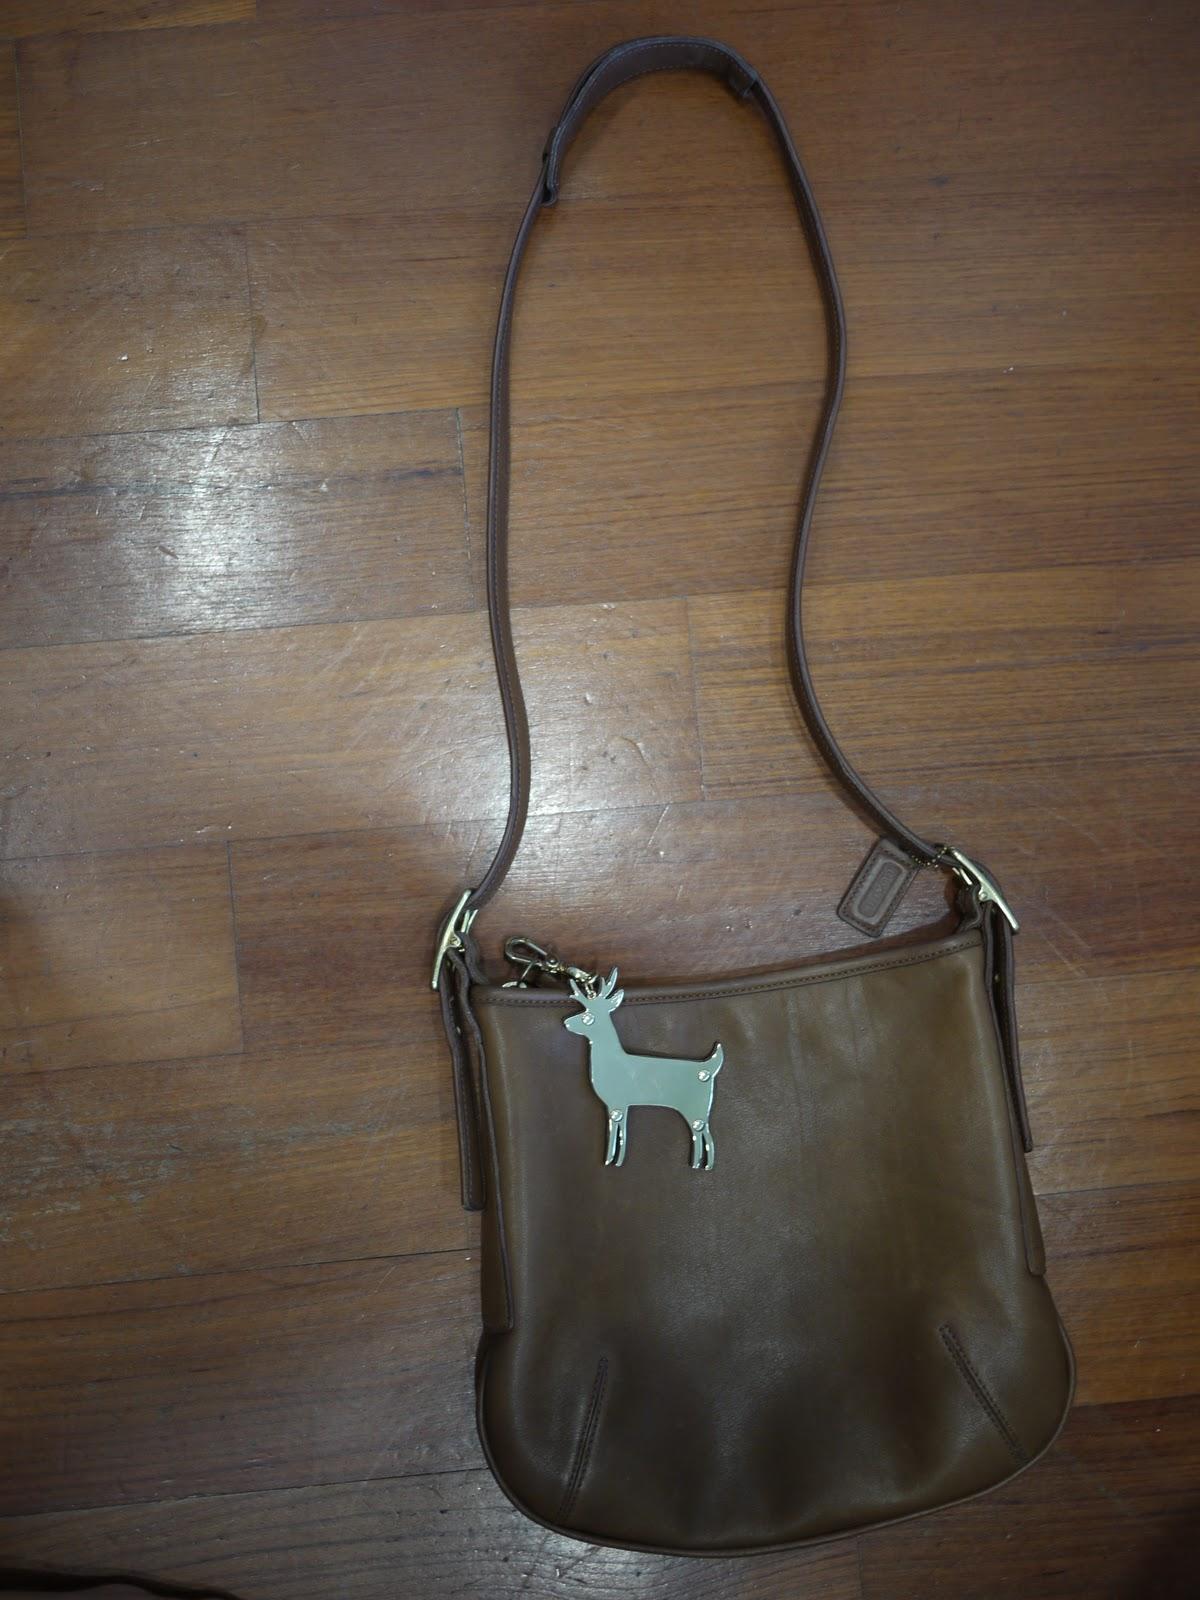 ShopaholiCouture: Vintage Coach Sling Bag